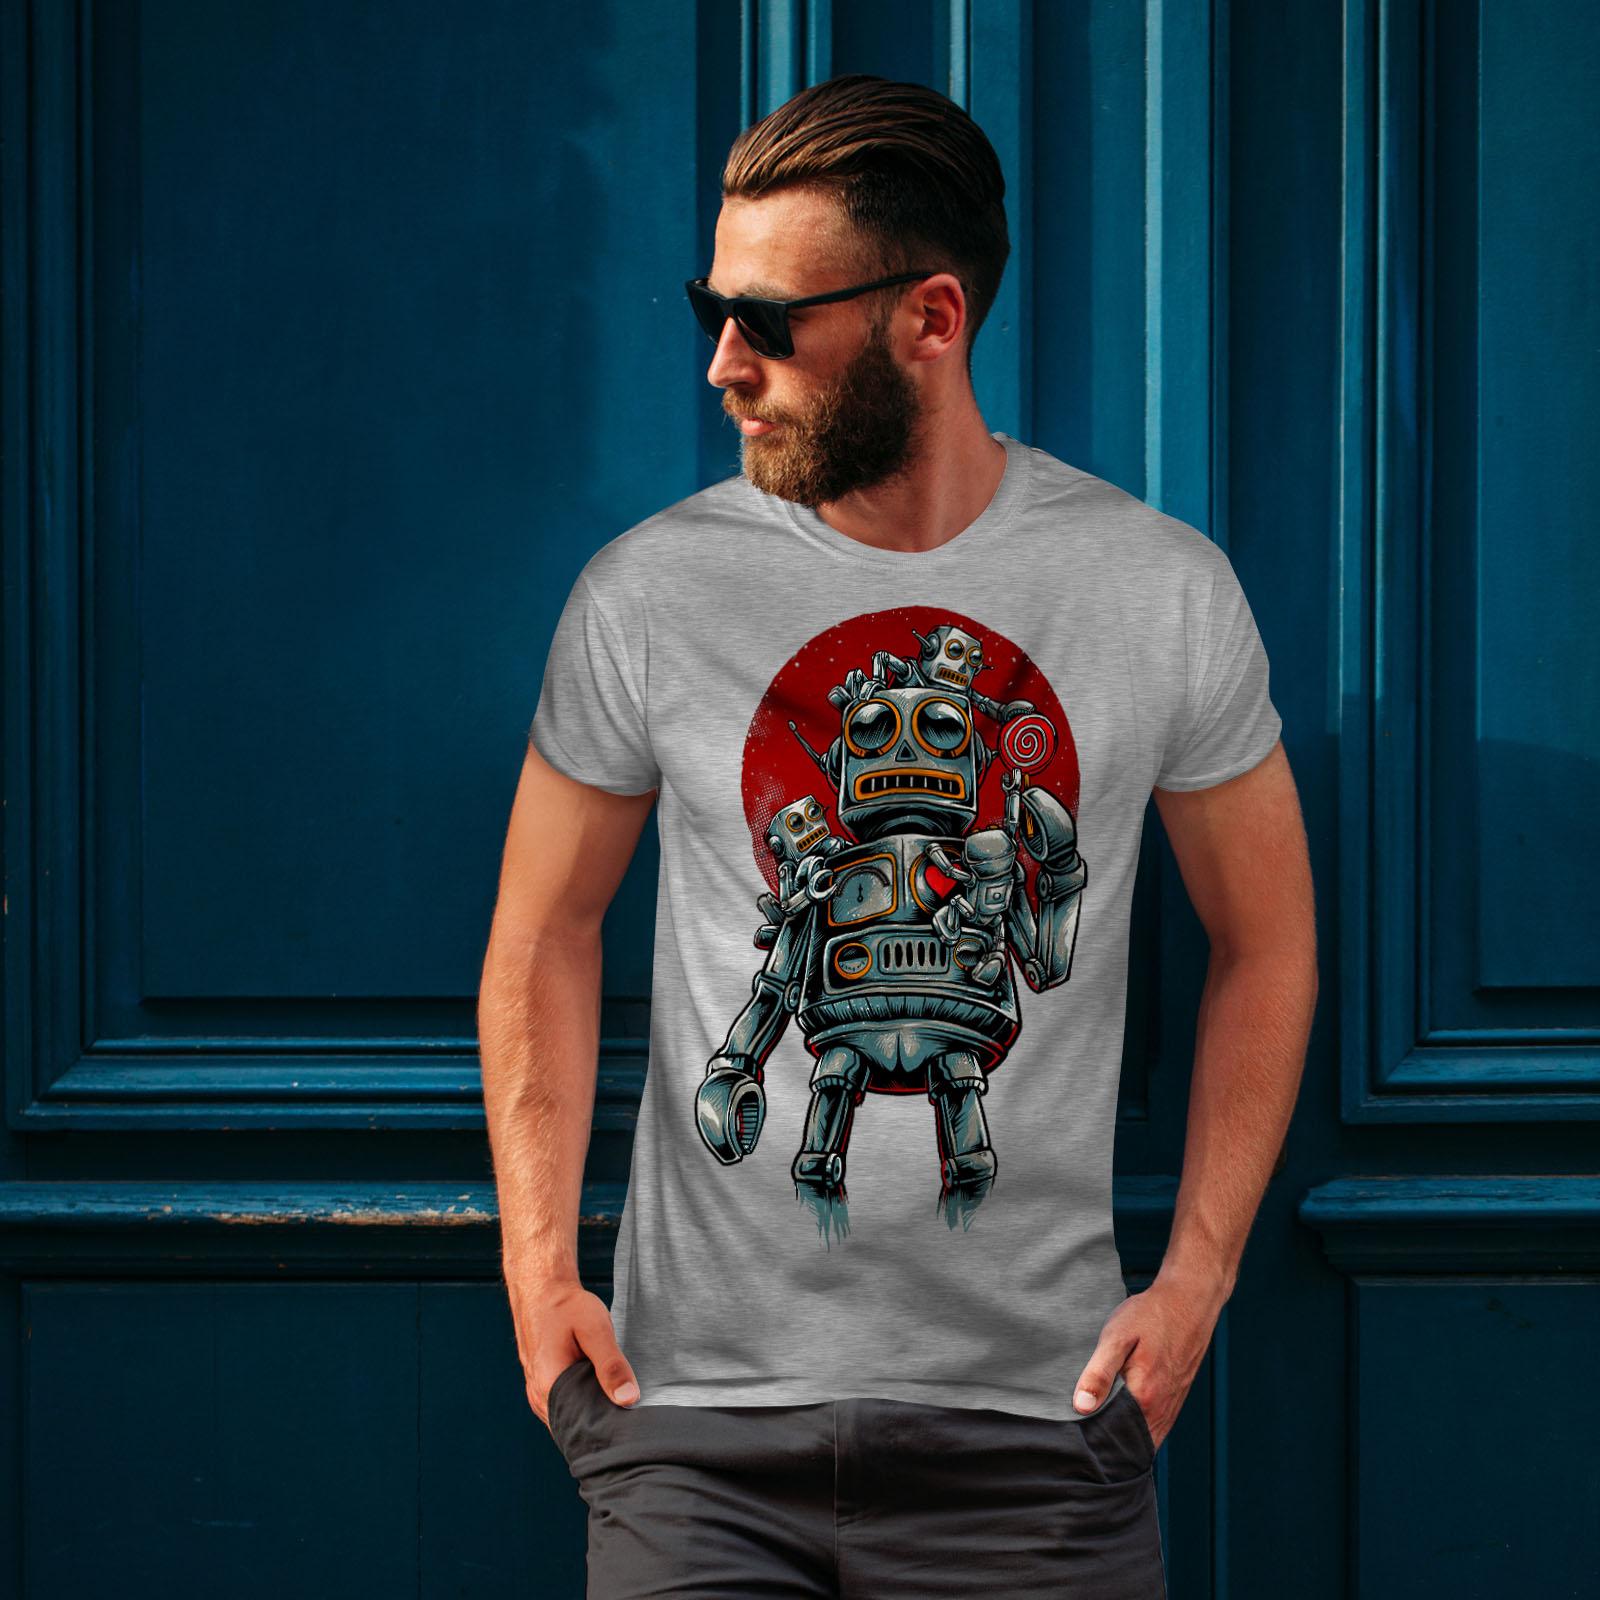 miniature 16 - Wellcoda Crazy Robot Mens T-shirt, Mechanical Graphic Design Printed Tee